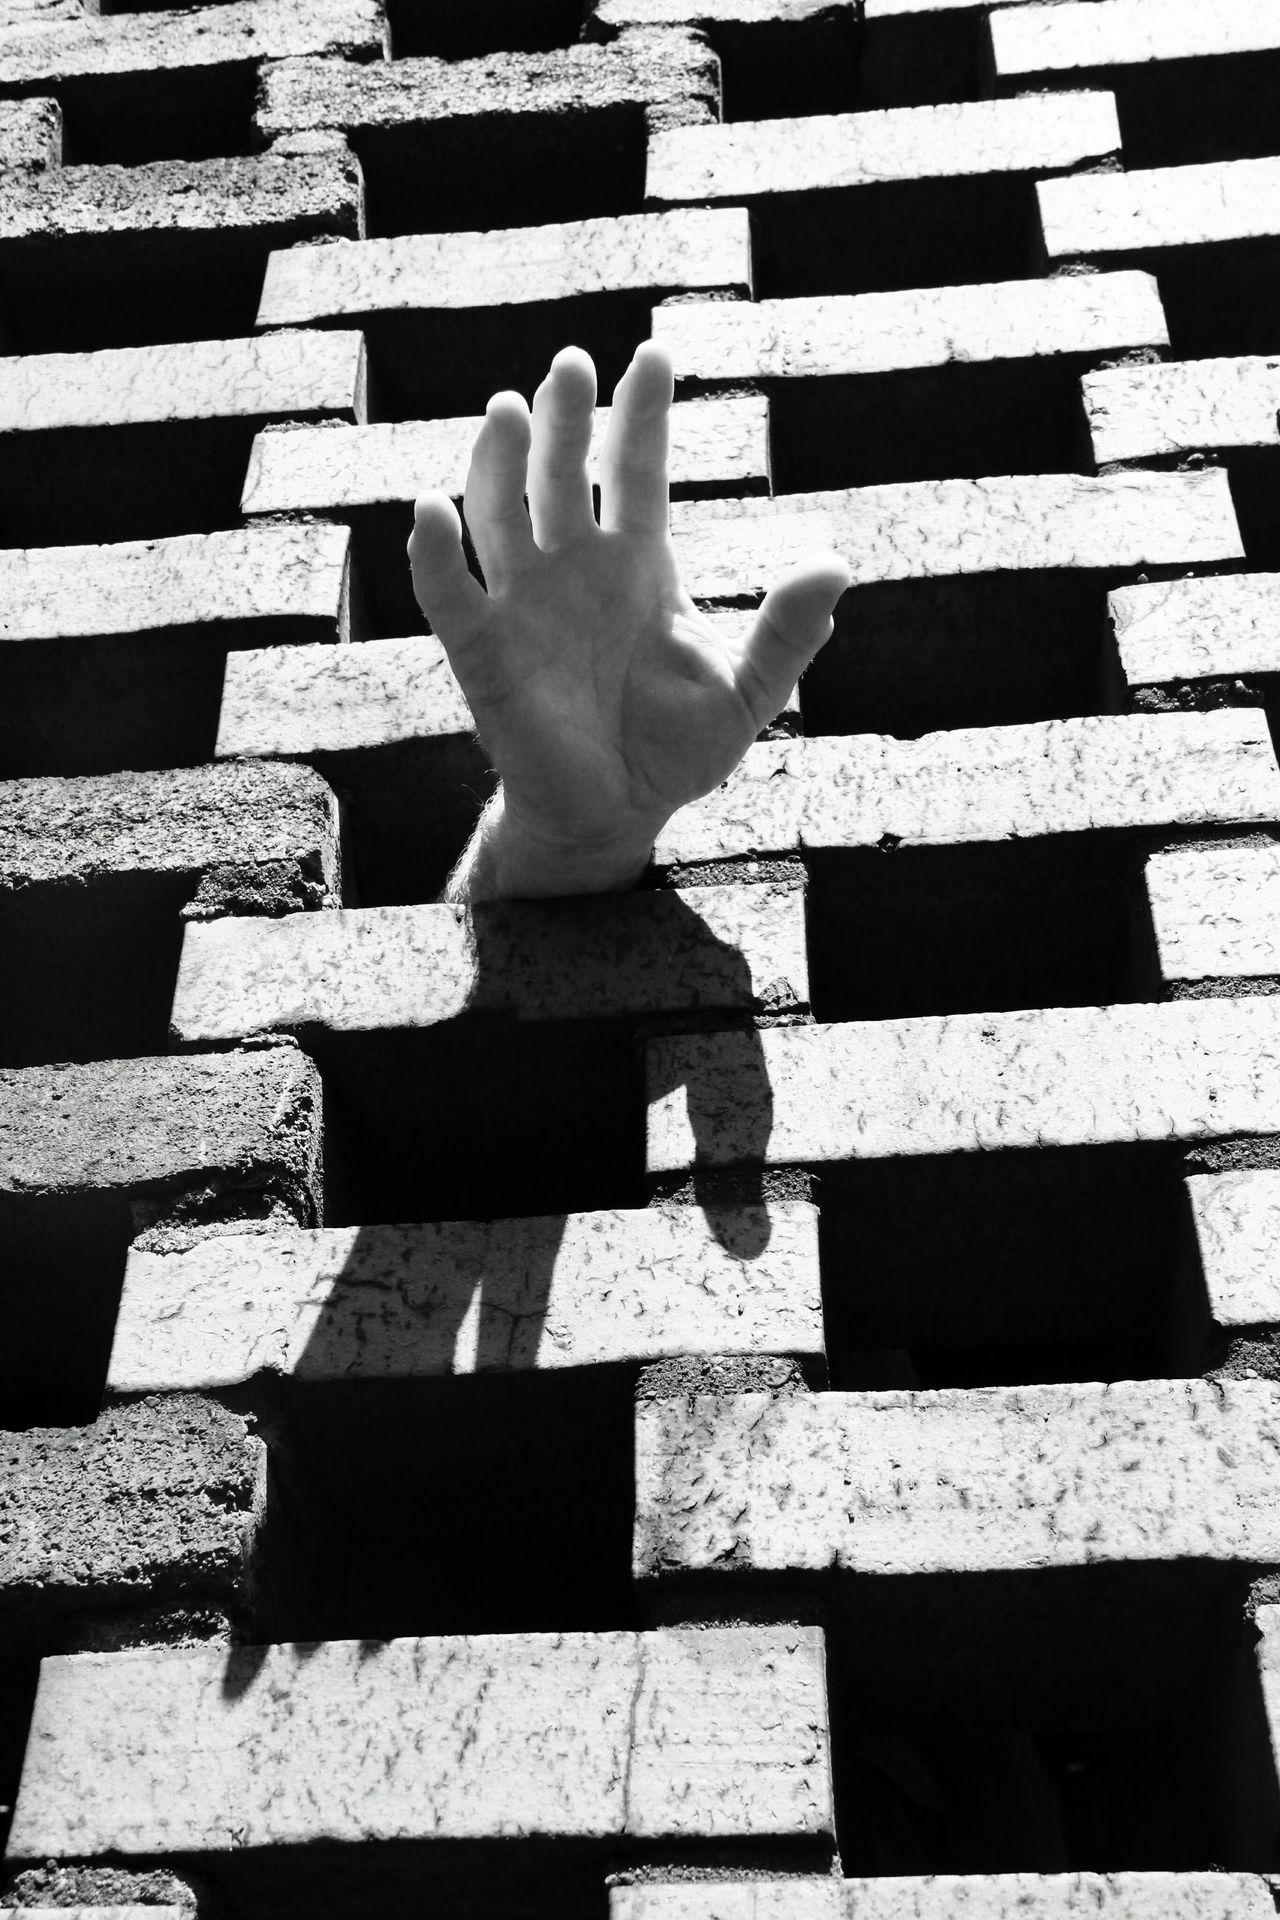 Helping Hand Taking Photos EyeEm Gallery Eeyemgallery EyeEm Best Shots Week On Eyeem Landschaftspark   Duisburg   Germany Industrial Architecture Taking Photos Black And White Black & White The City Light The Secret Spaces Resist Break The Mold TCPM Art Is Everywhere